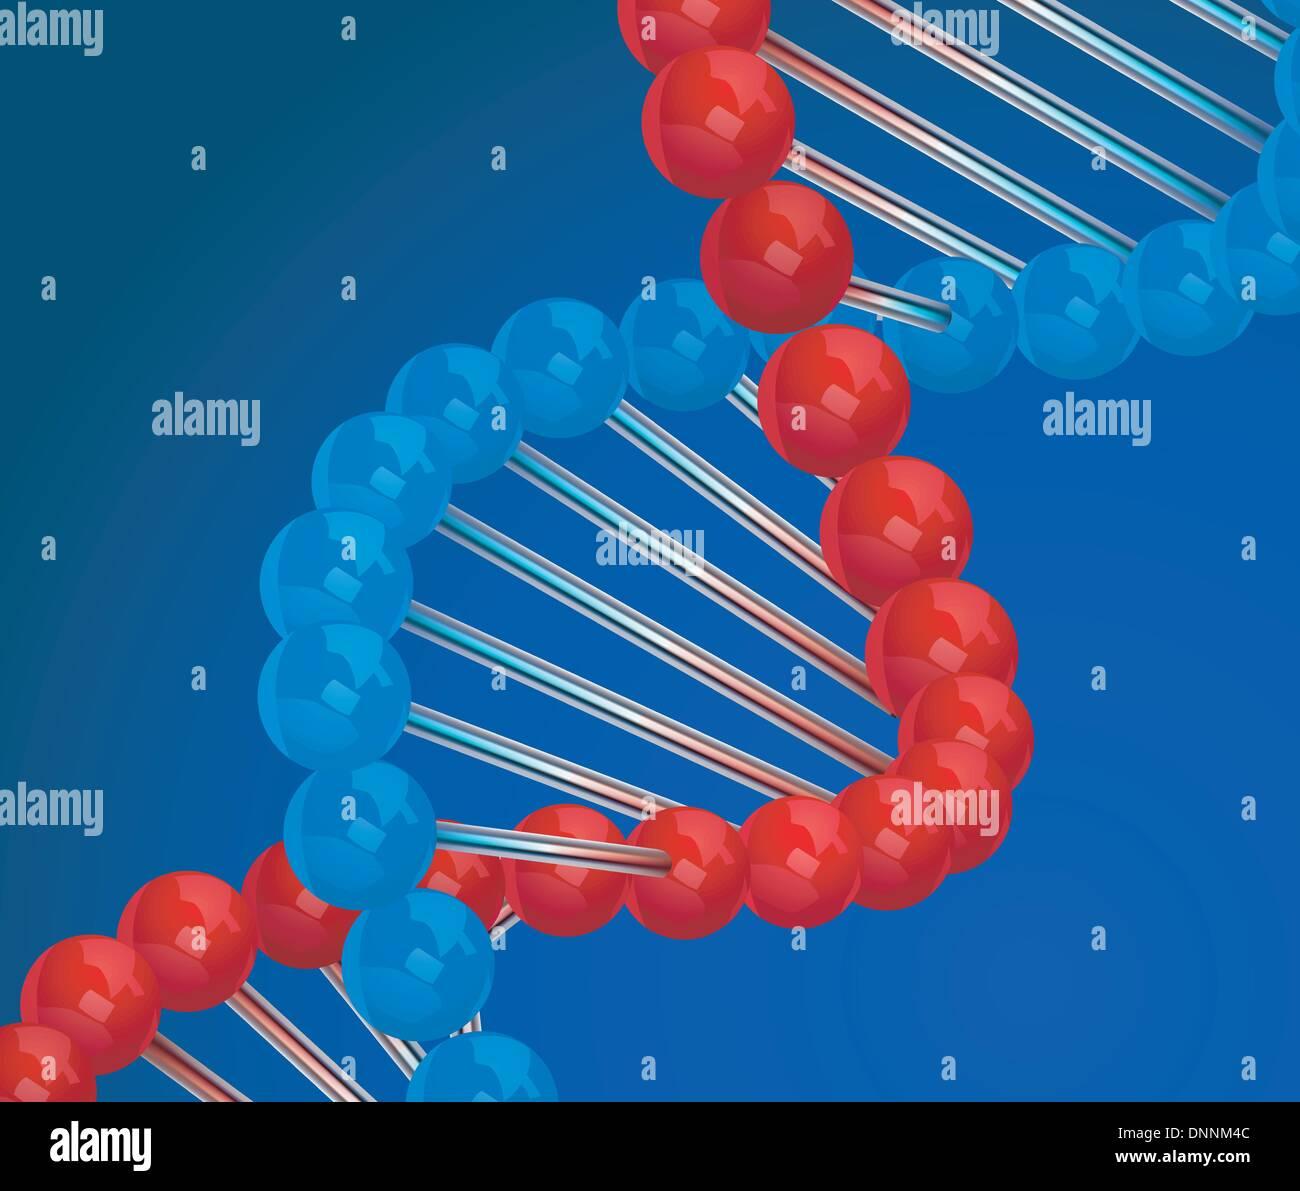 DNA 3d Vektor-Illustration auf blauem Hintergrund Stockbild